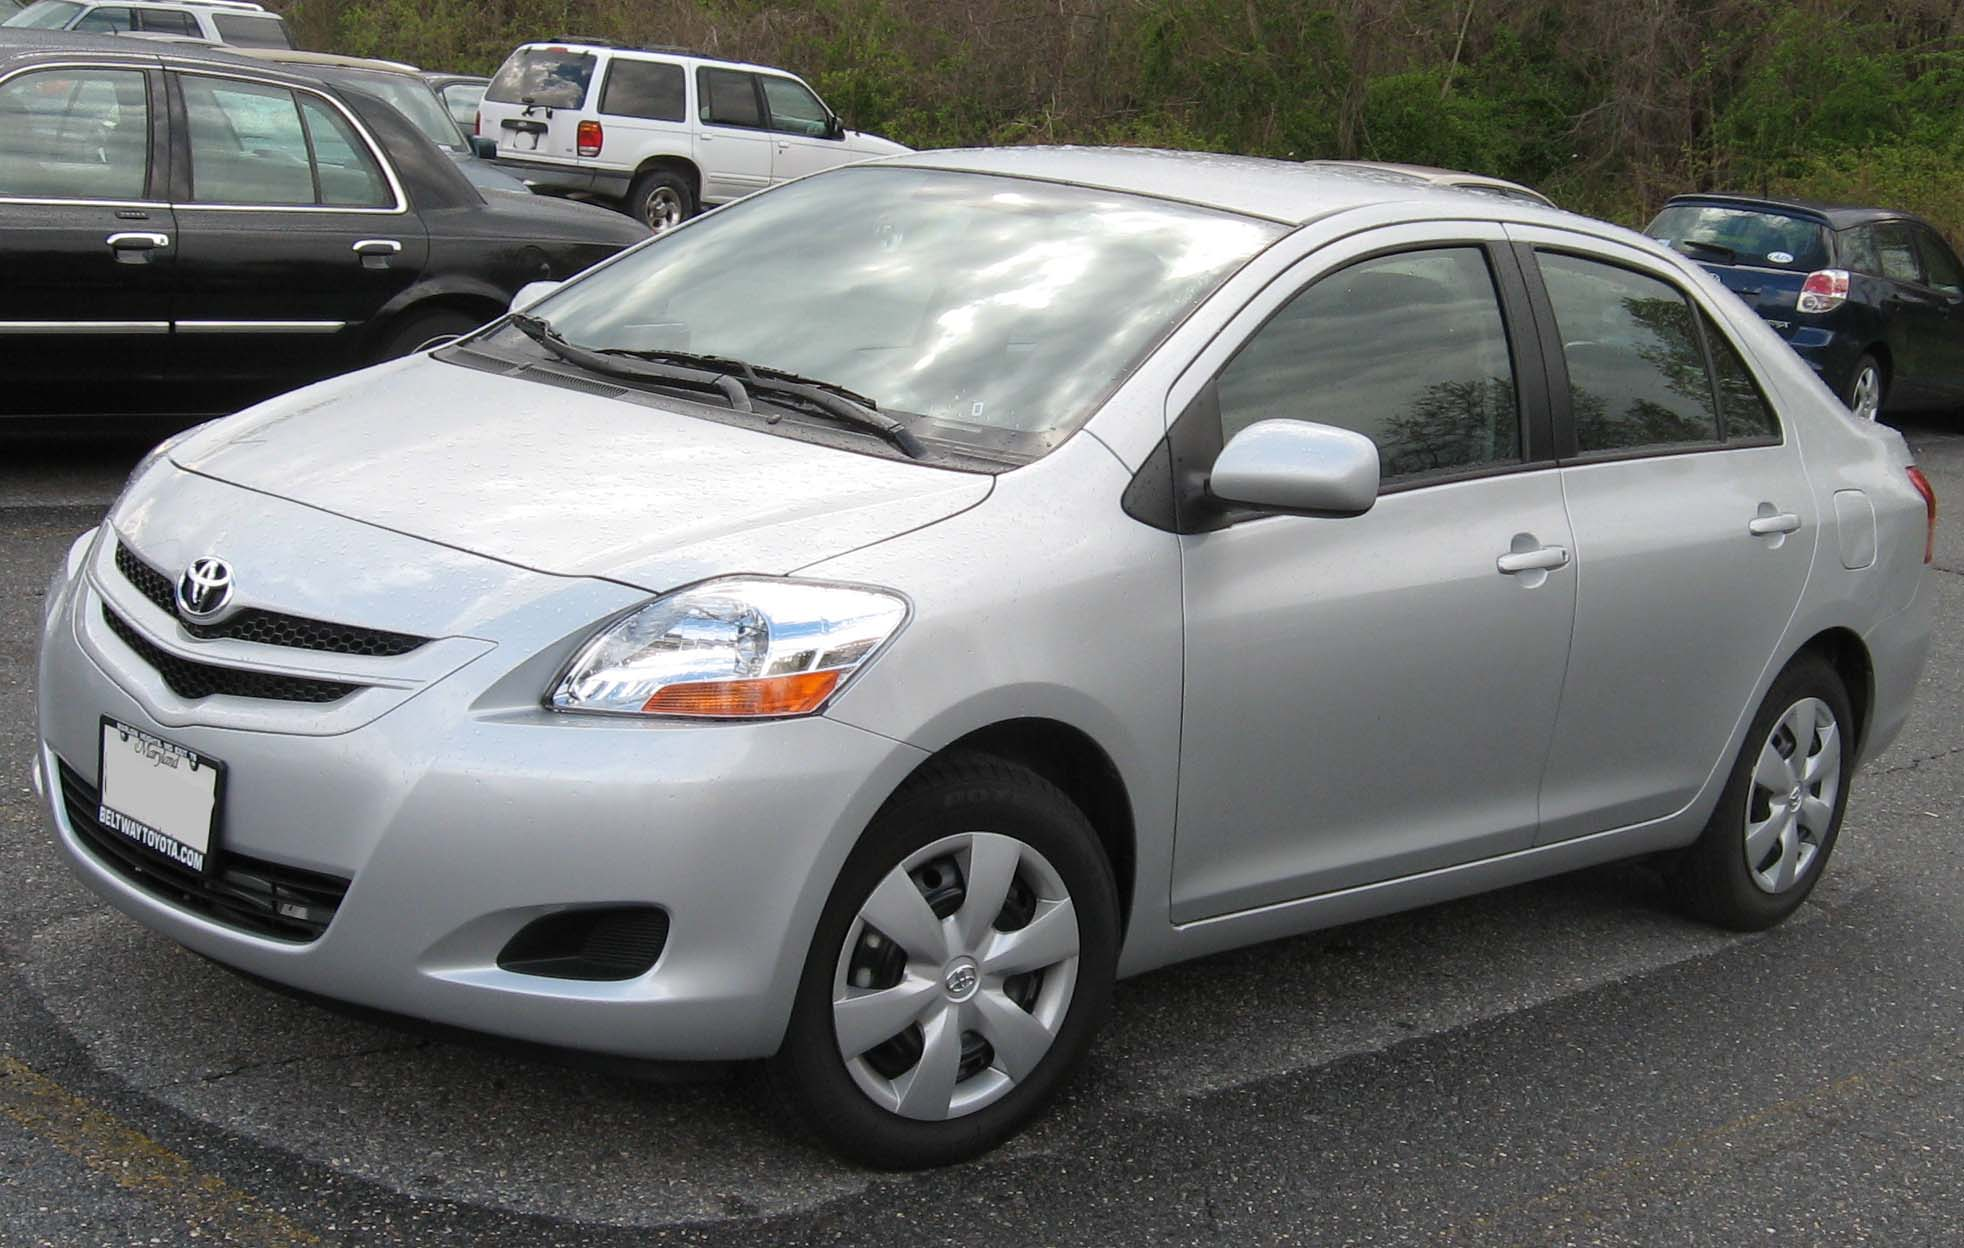 http://upload.wikimedia.org/wikipedia/commons/0/0c/07-Toyota-Yaris-Base-sedan.jpg